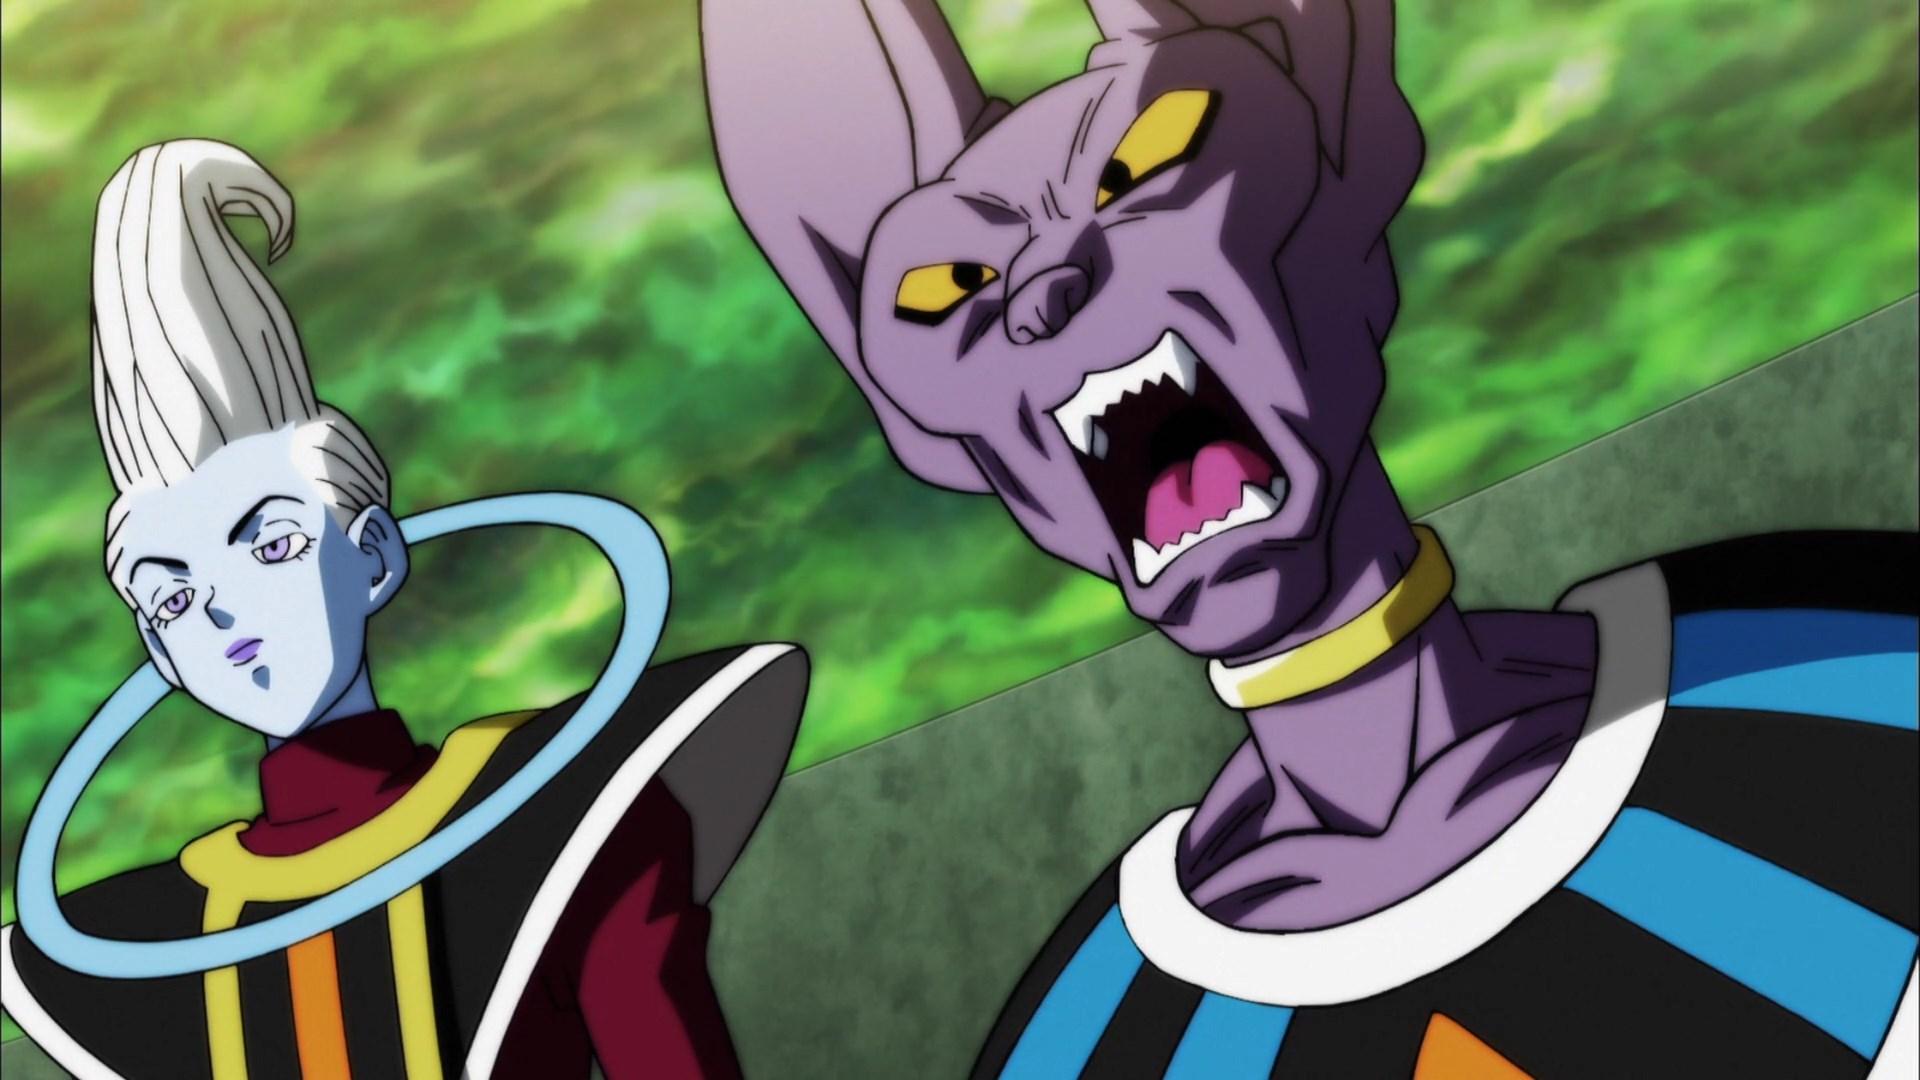 [HorribleSubs] Dragon Ball Super - 121 [1080p].mkv_snapshot_06.24